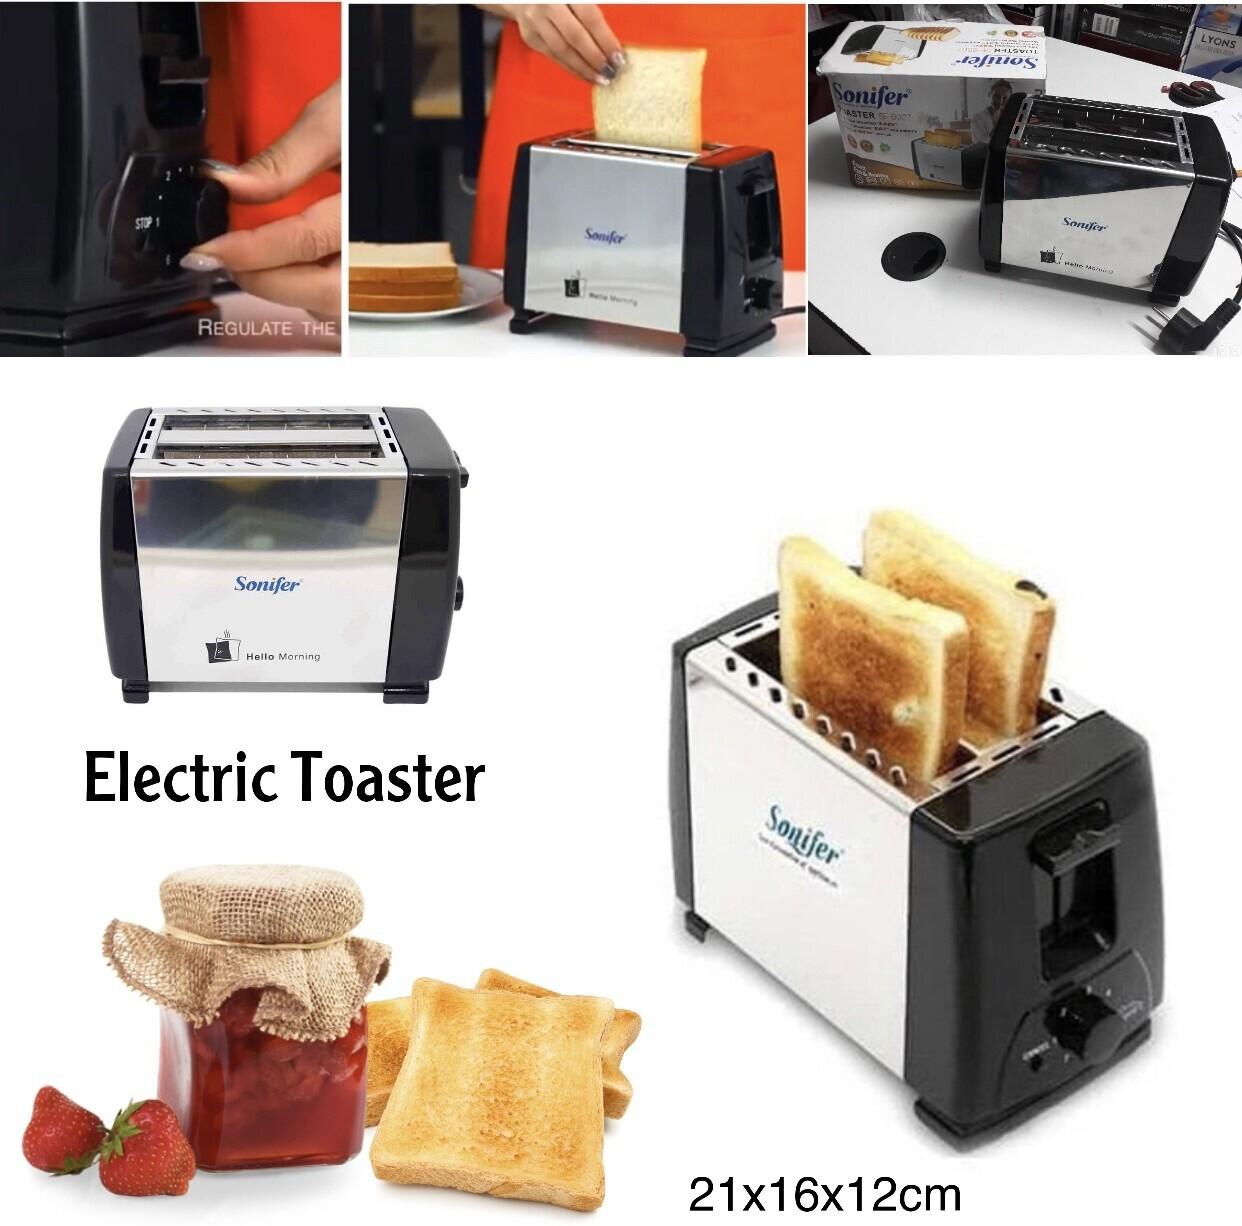 Sonifer Toaster